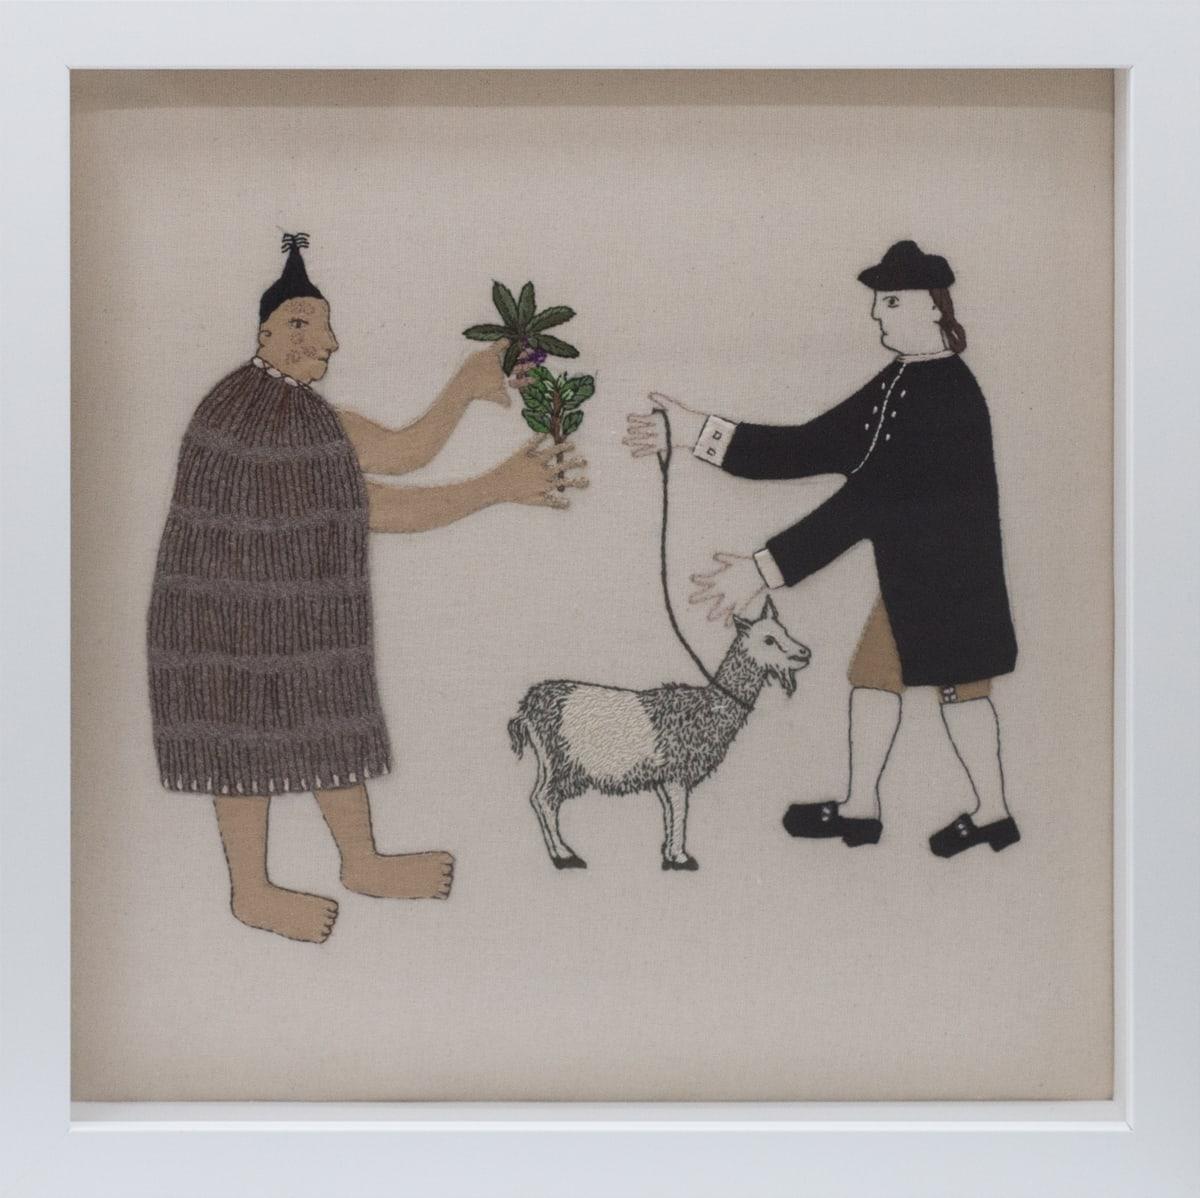 Sarah Munro, Trade Items: Goat, Mahoe, Papauma, 2018